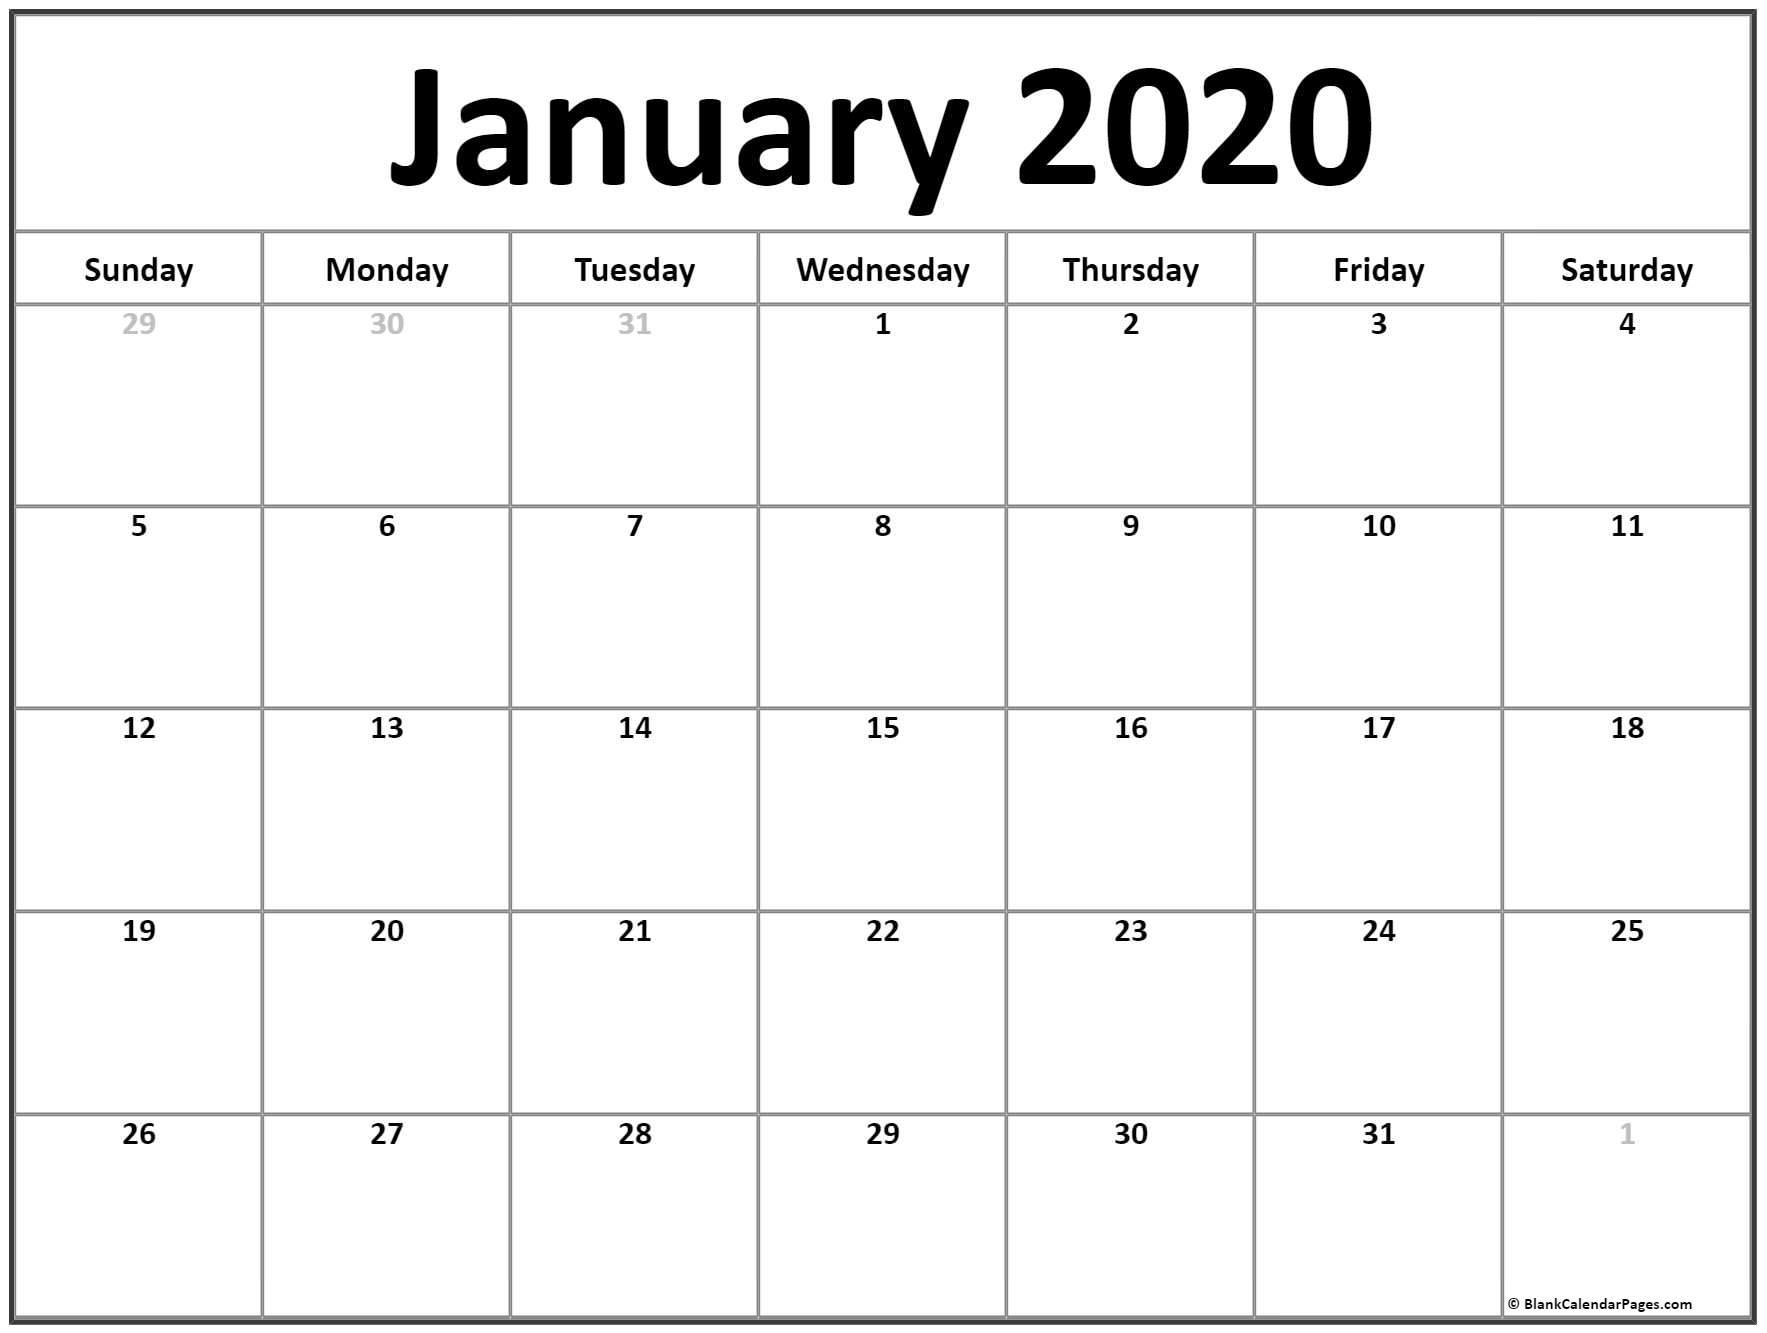 Calendar January 2020 Template - Togo.wpart.co